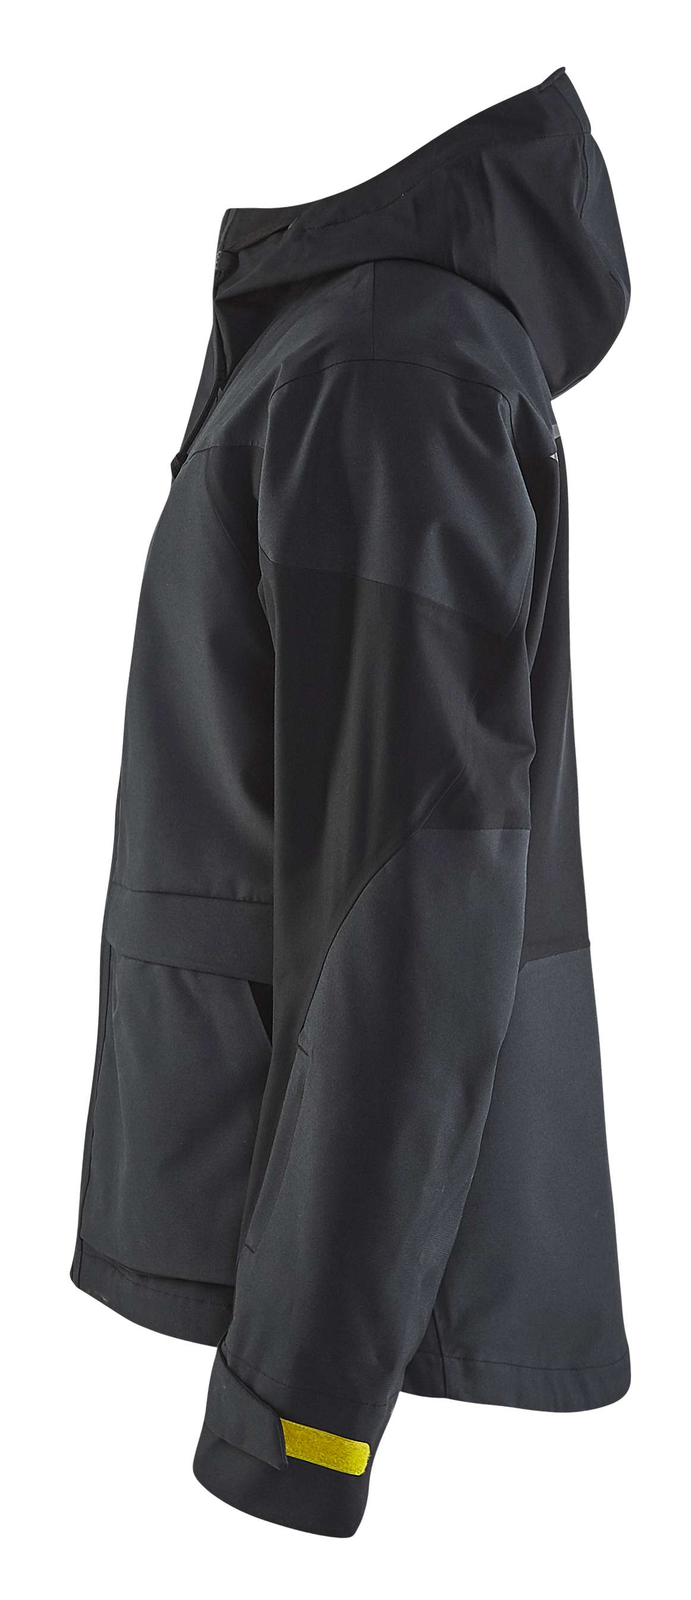 Blaklader Regenjacks 49901919 zwart(9900)